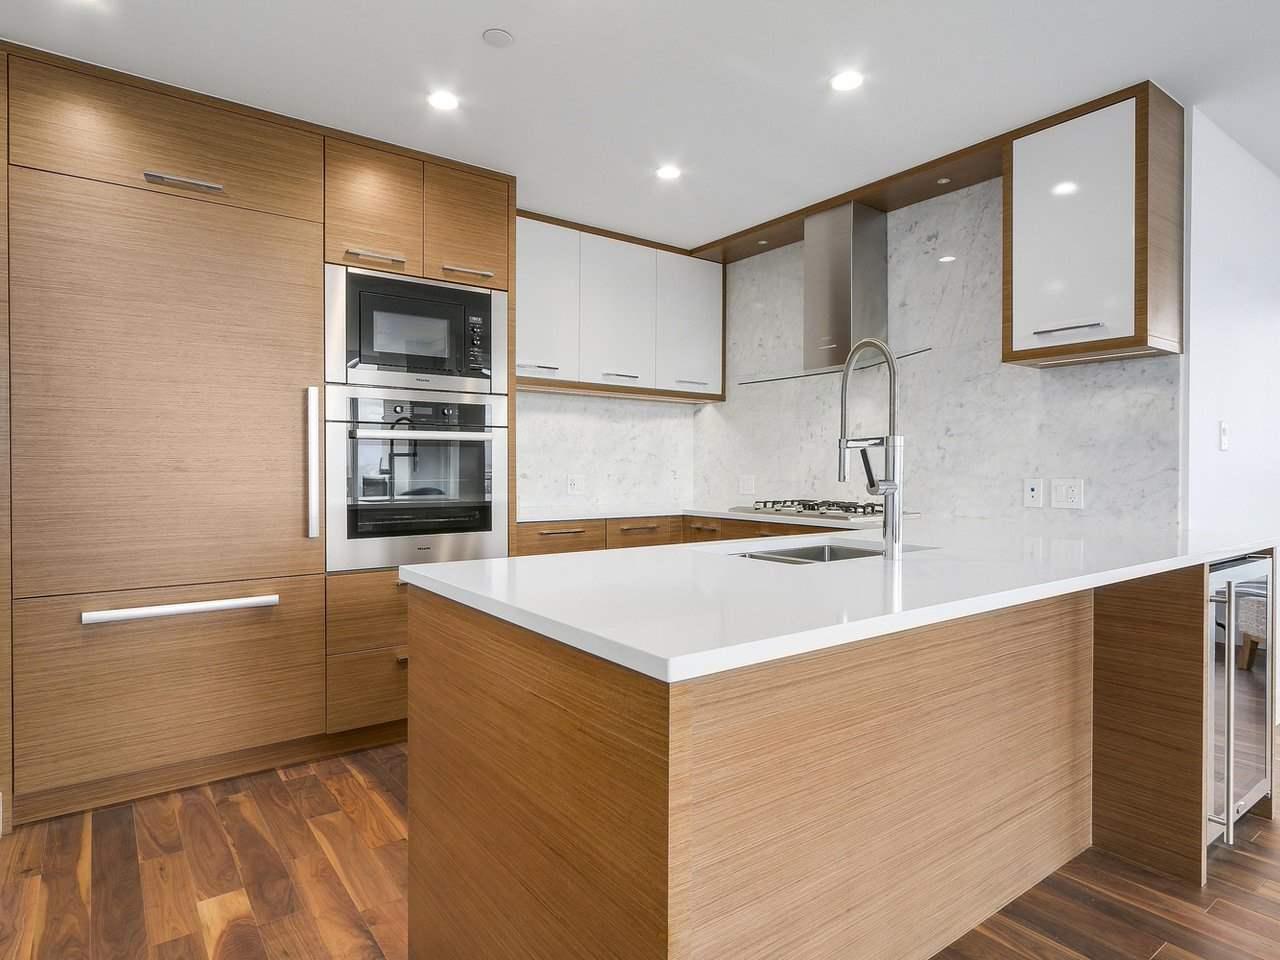 Condo Apartment at 1202 4360 BERESFORD STREET, Unit 1202, Burnaby South, British Columbia. Image 3